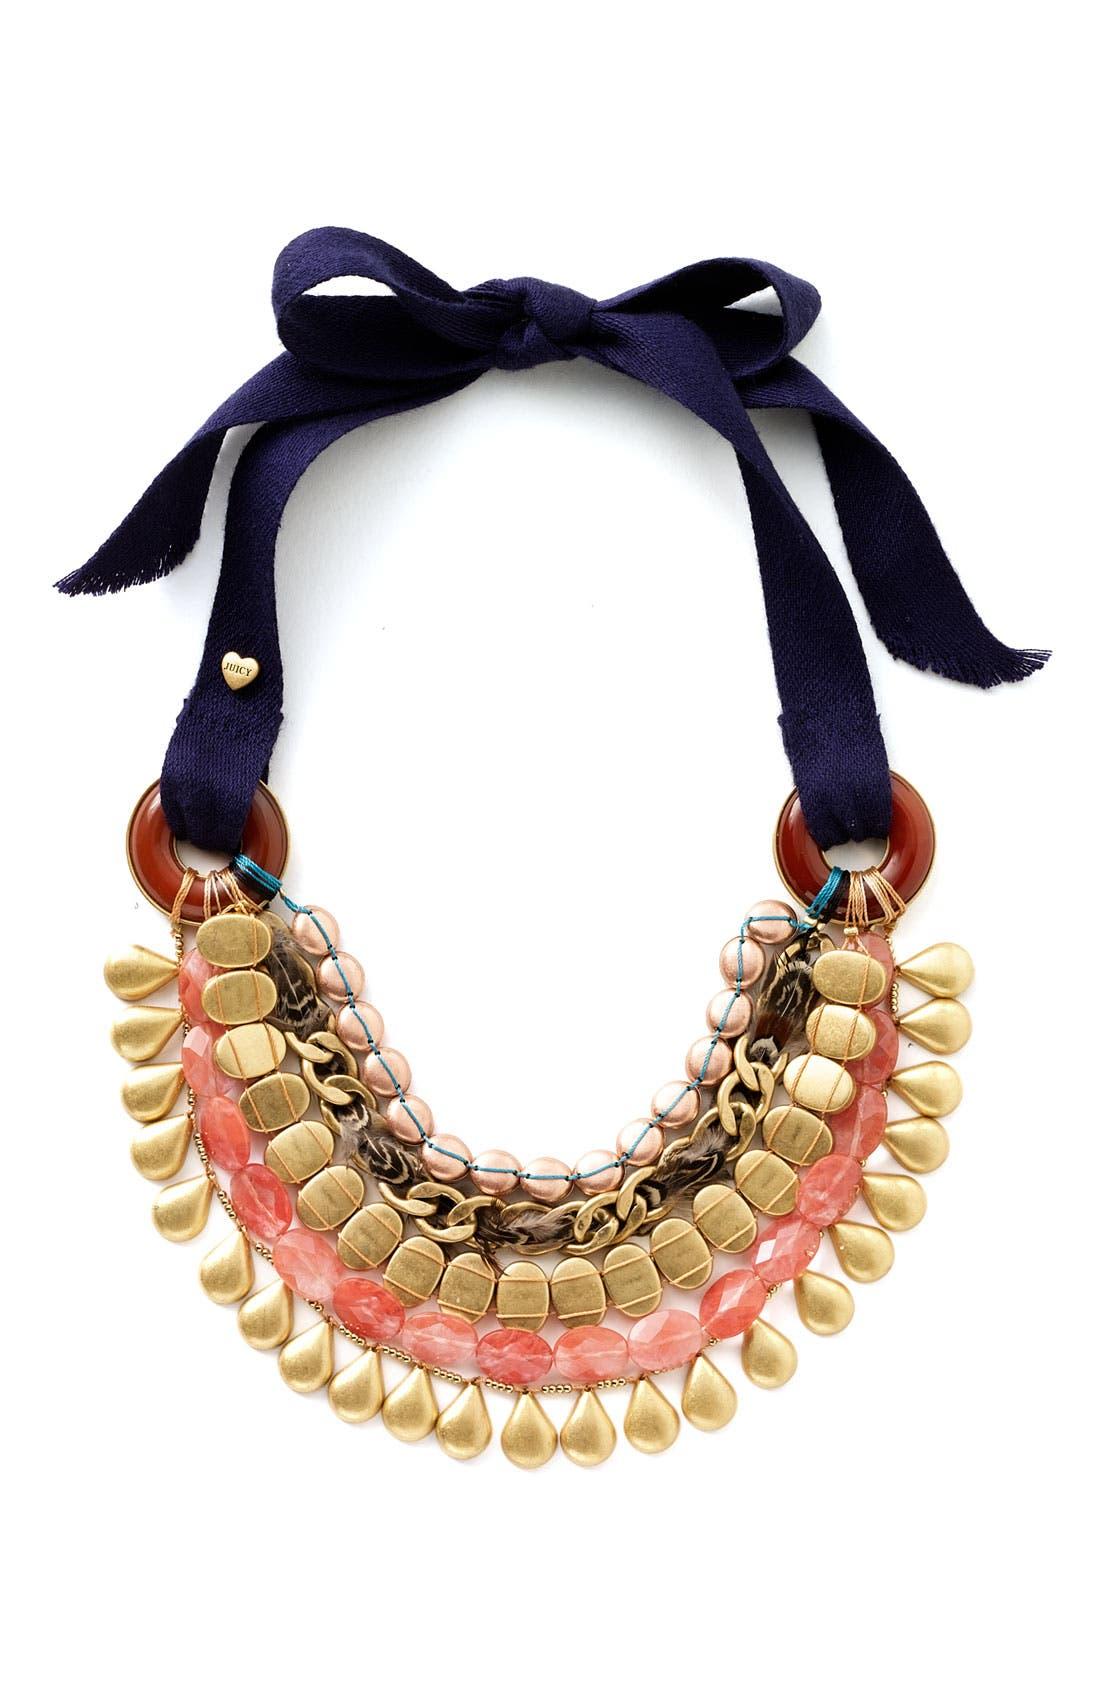 Main Image - Juicy Couture 'Modern Nostalgia' Beaded Bib Necklace